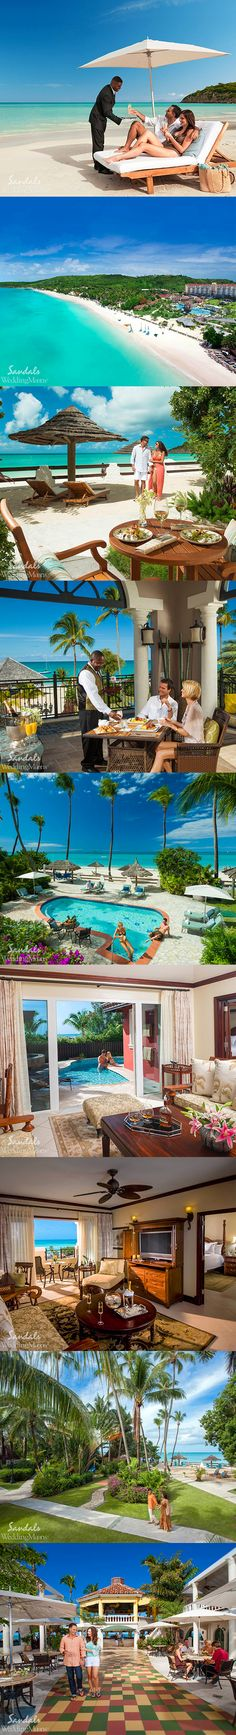 Sandals Wedding Insiders: Honeymoon in Antigua, Honeymoon Planning, Best Honeymoon, Honeymoon Destinations, Amazing Destinations, Honeymoon Ideas, Sandals Honeymoon, Sandals Beach Resort, Sandals Wedding, Sandals All Inclusive Resorts